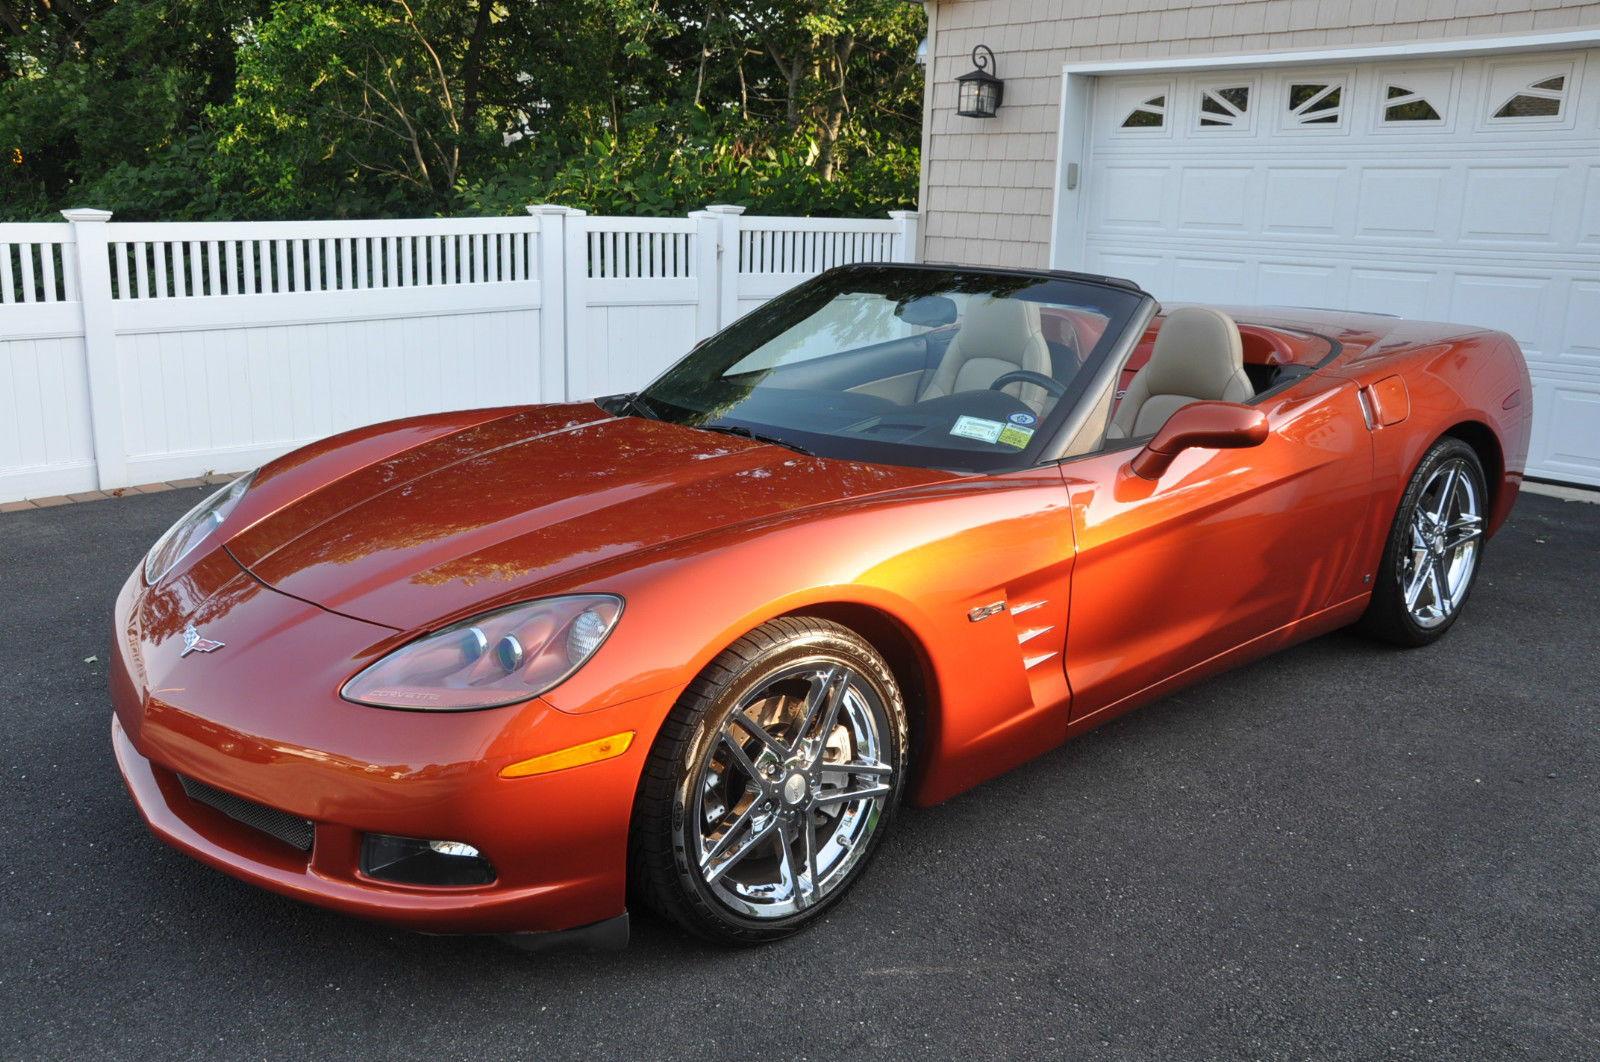 fs 2006 daytona sunset orange convertible corvetteforum chevrolet corvette forum discussion. Black Bedroom Furniture Sets. Home Design Ideas